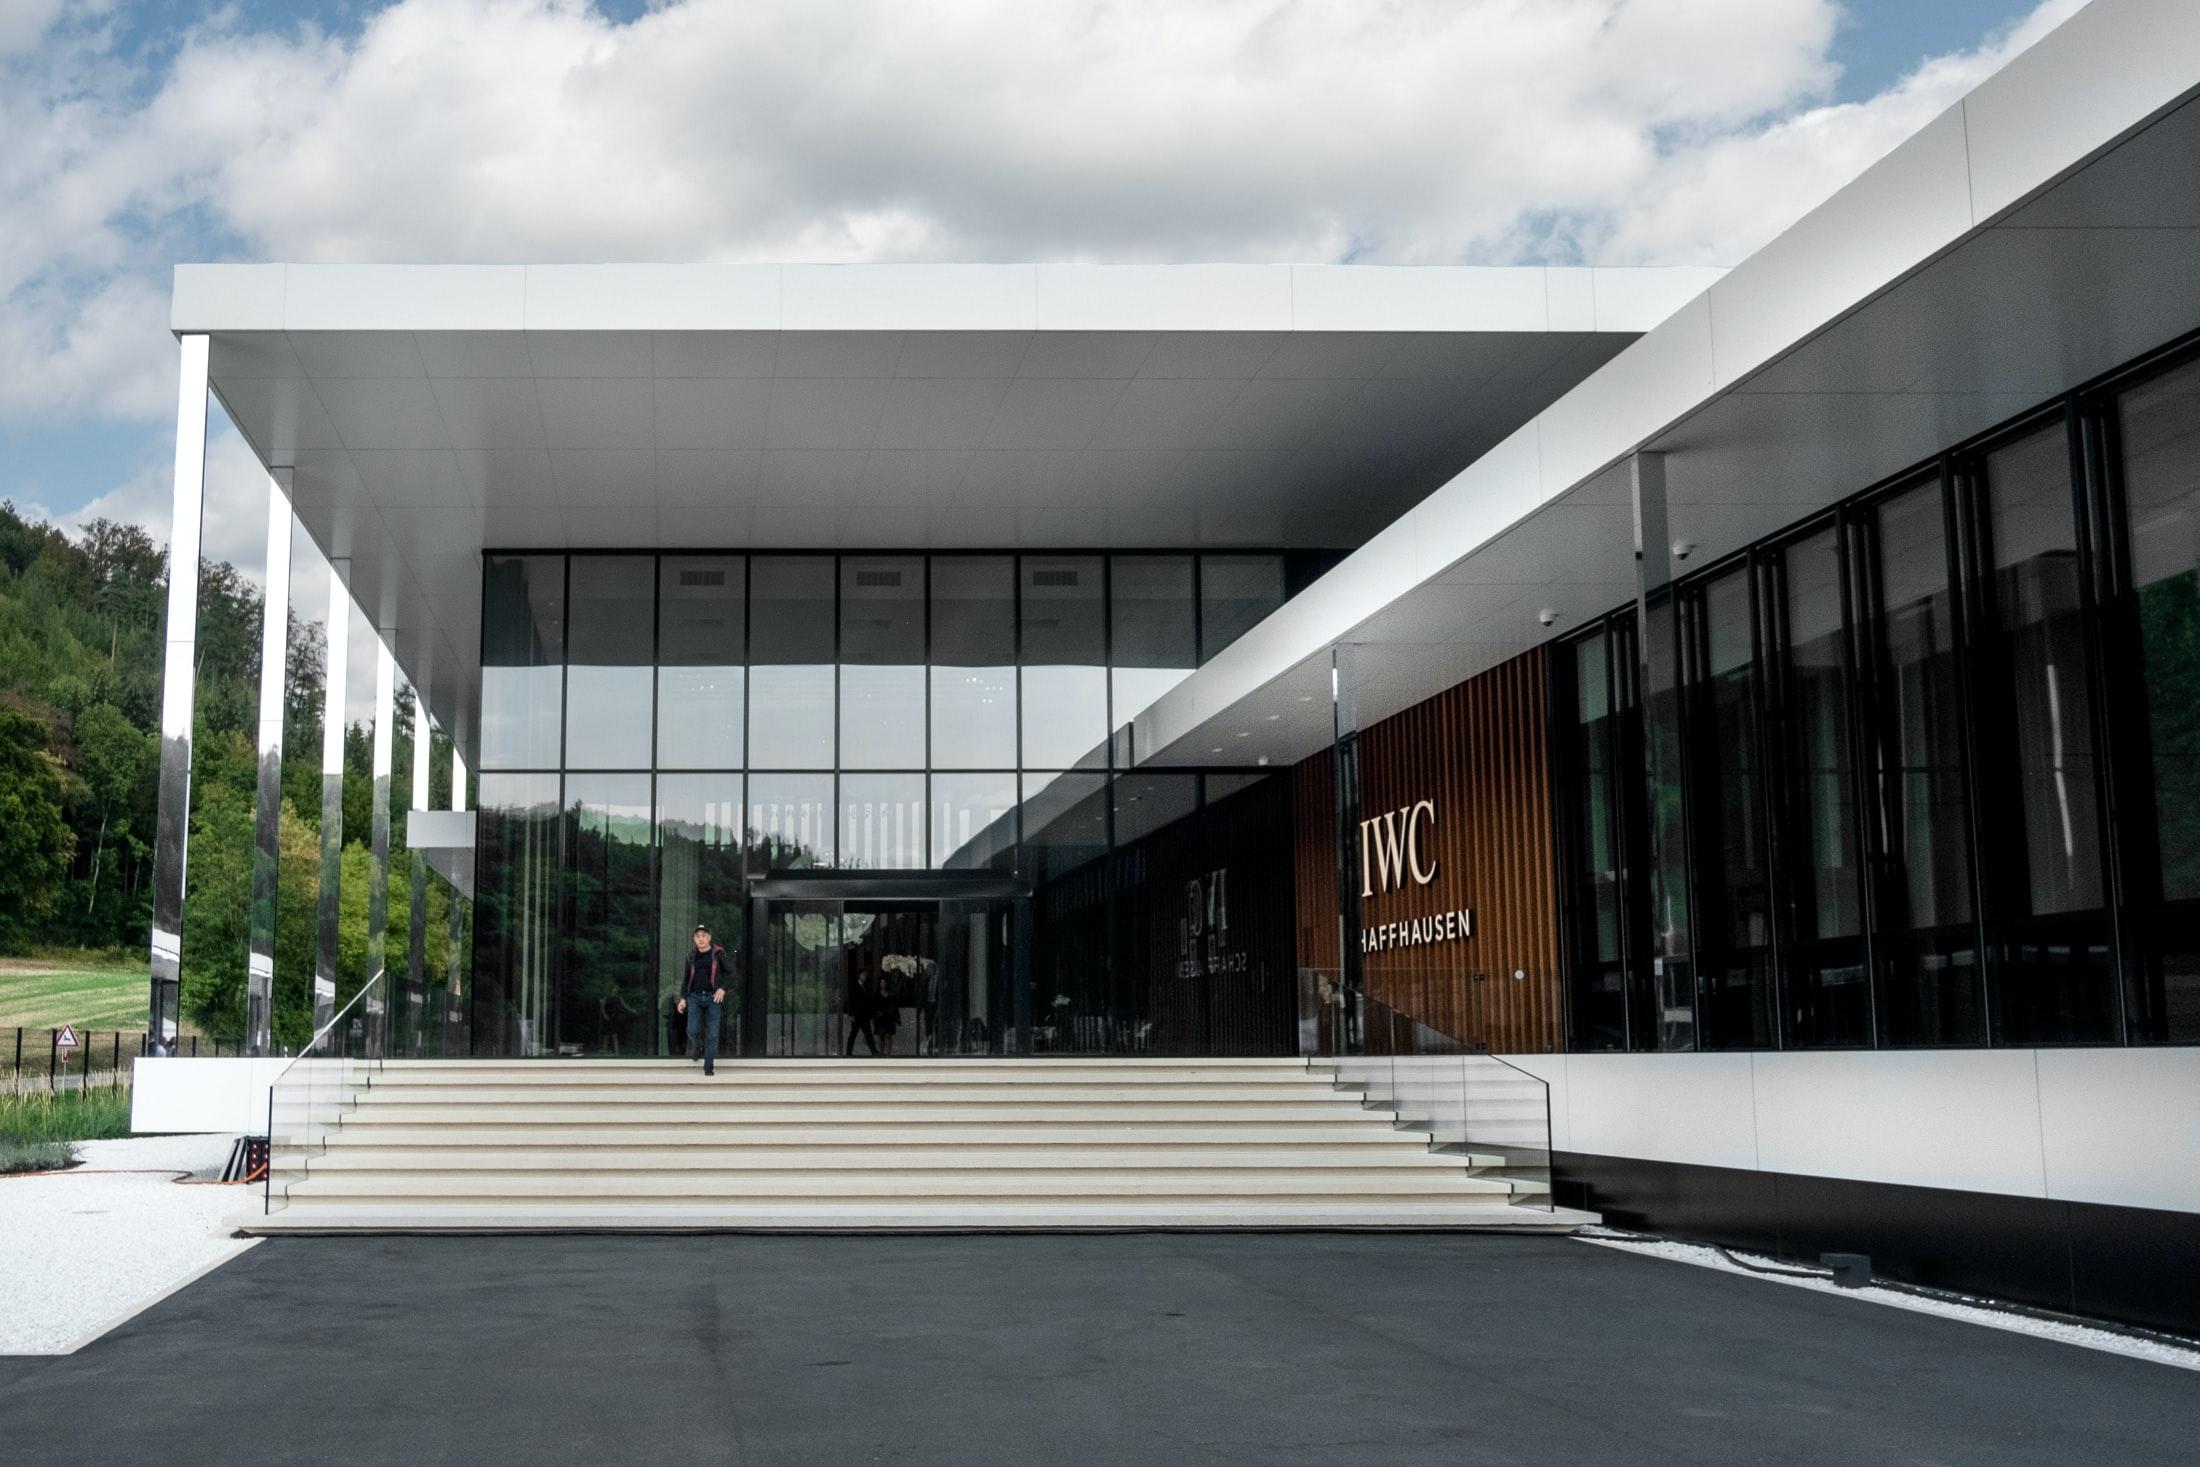 Inside The Manufacture: The New IWC Manufakturzentrum DSCF9309